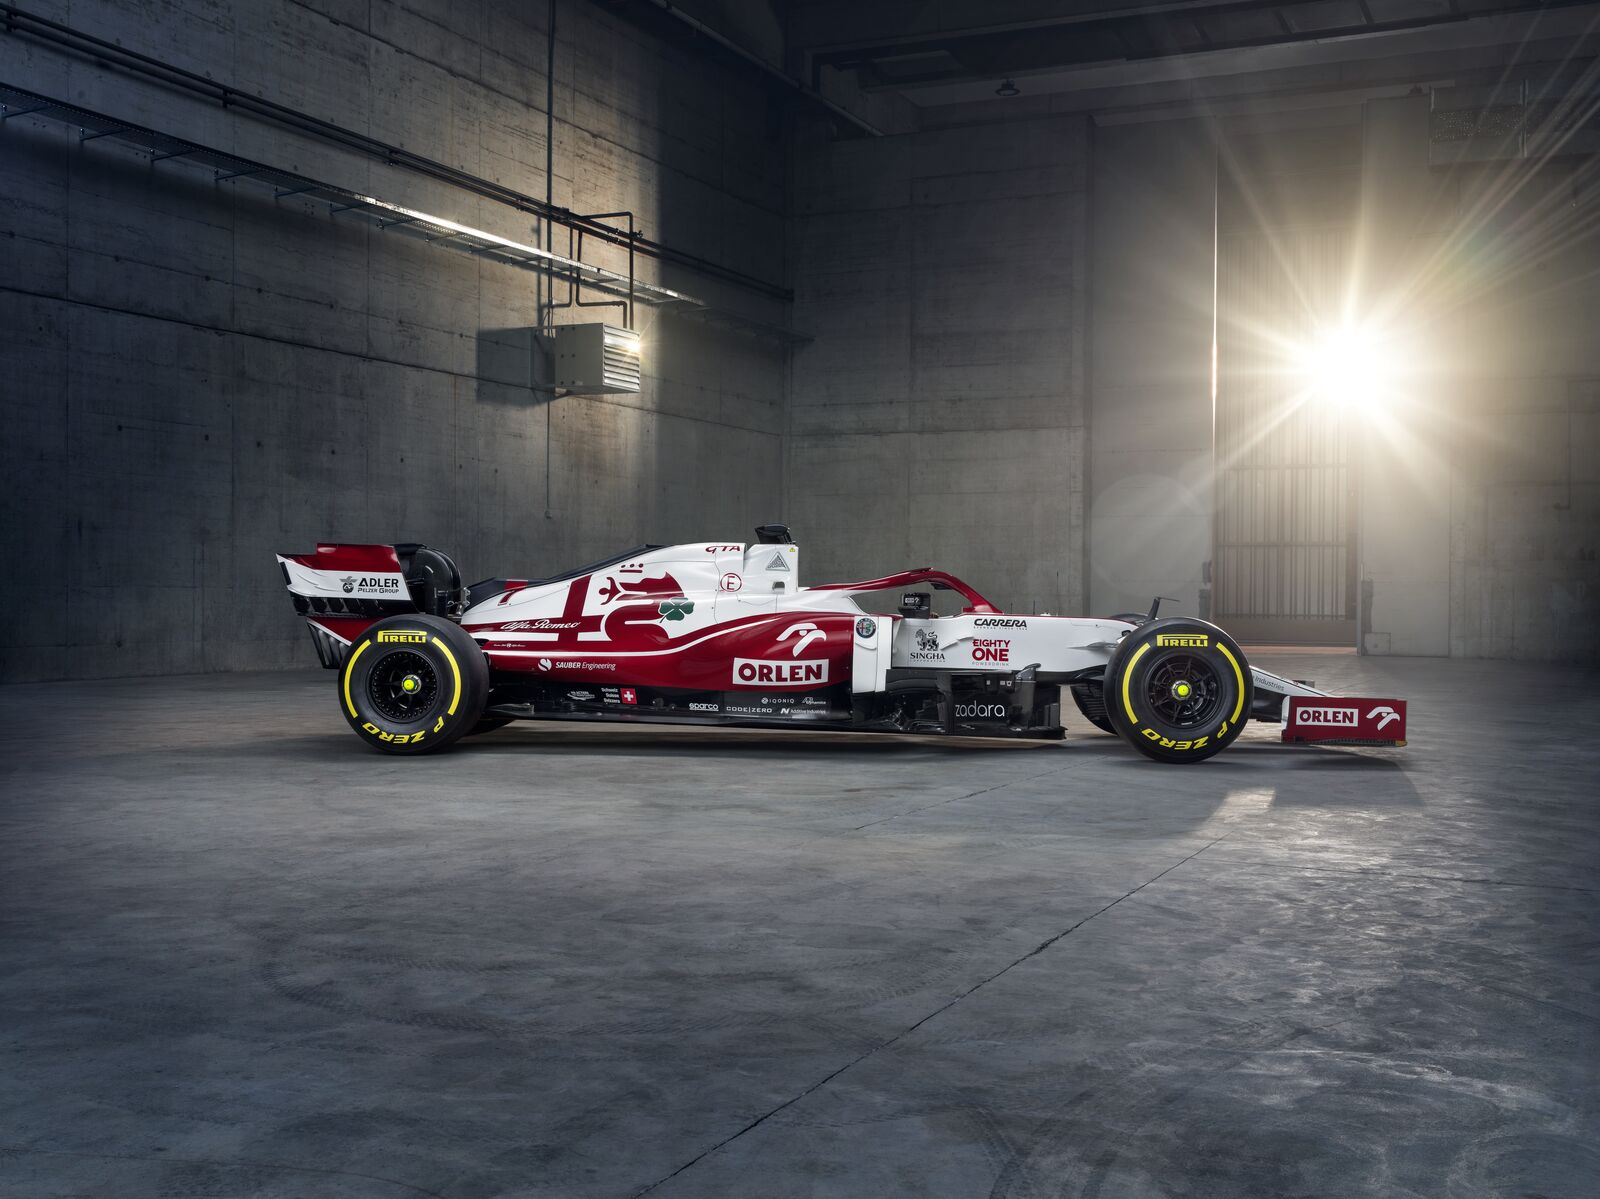 Jan Monchaux F1 Formula 1 Alfa Romeo C41 2021 car Kimi Raikkonen Antonio Giovinazzi